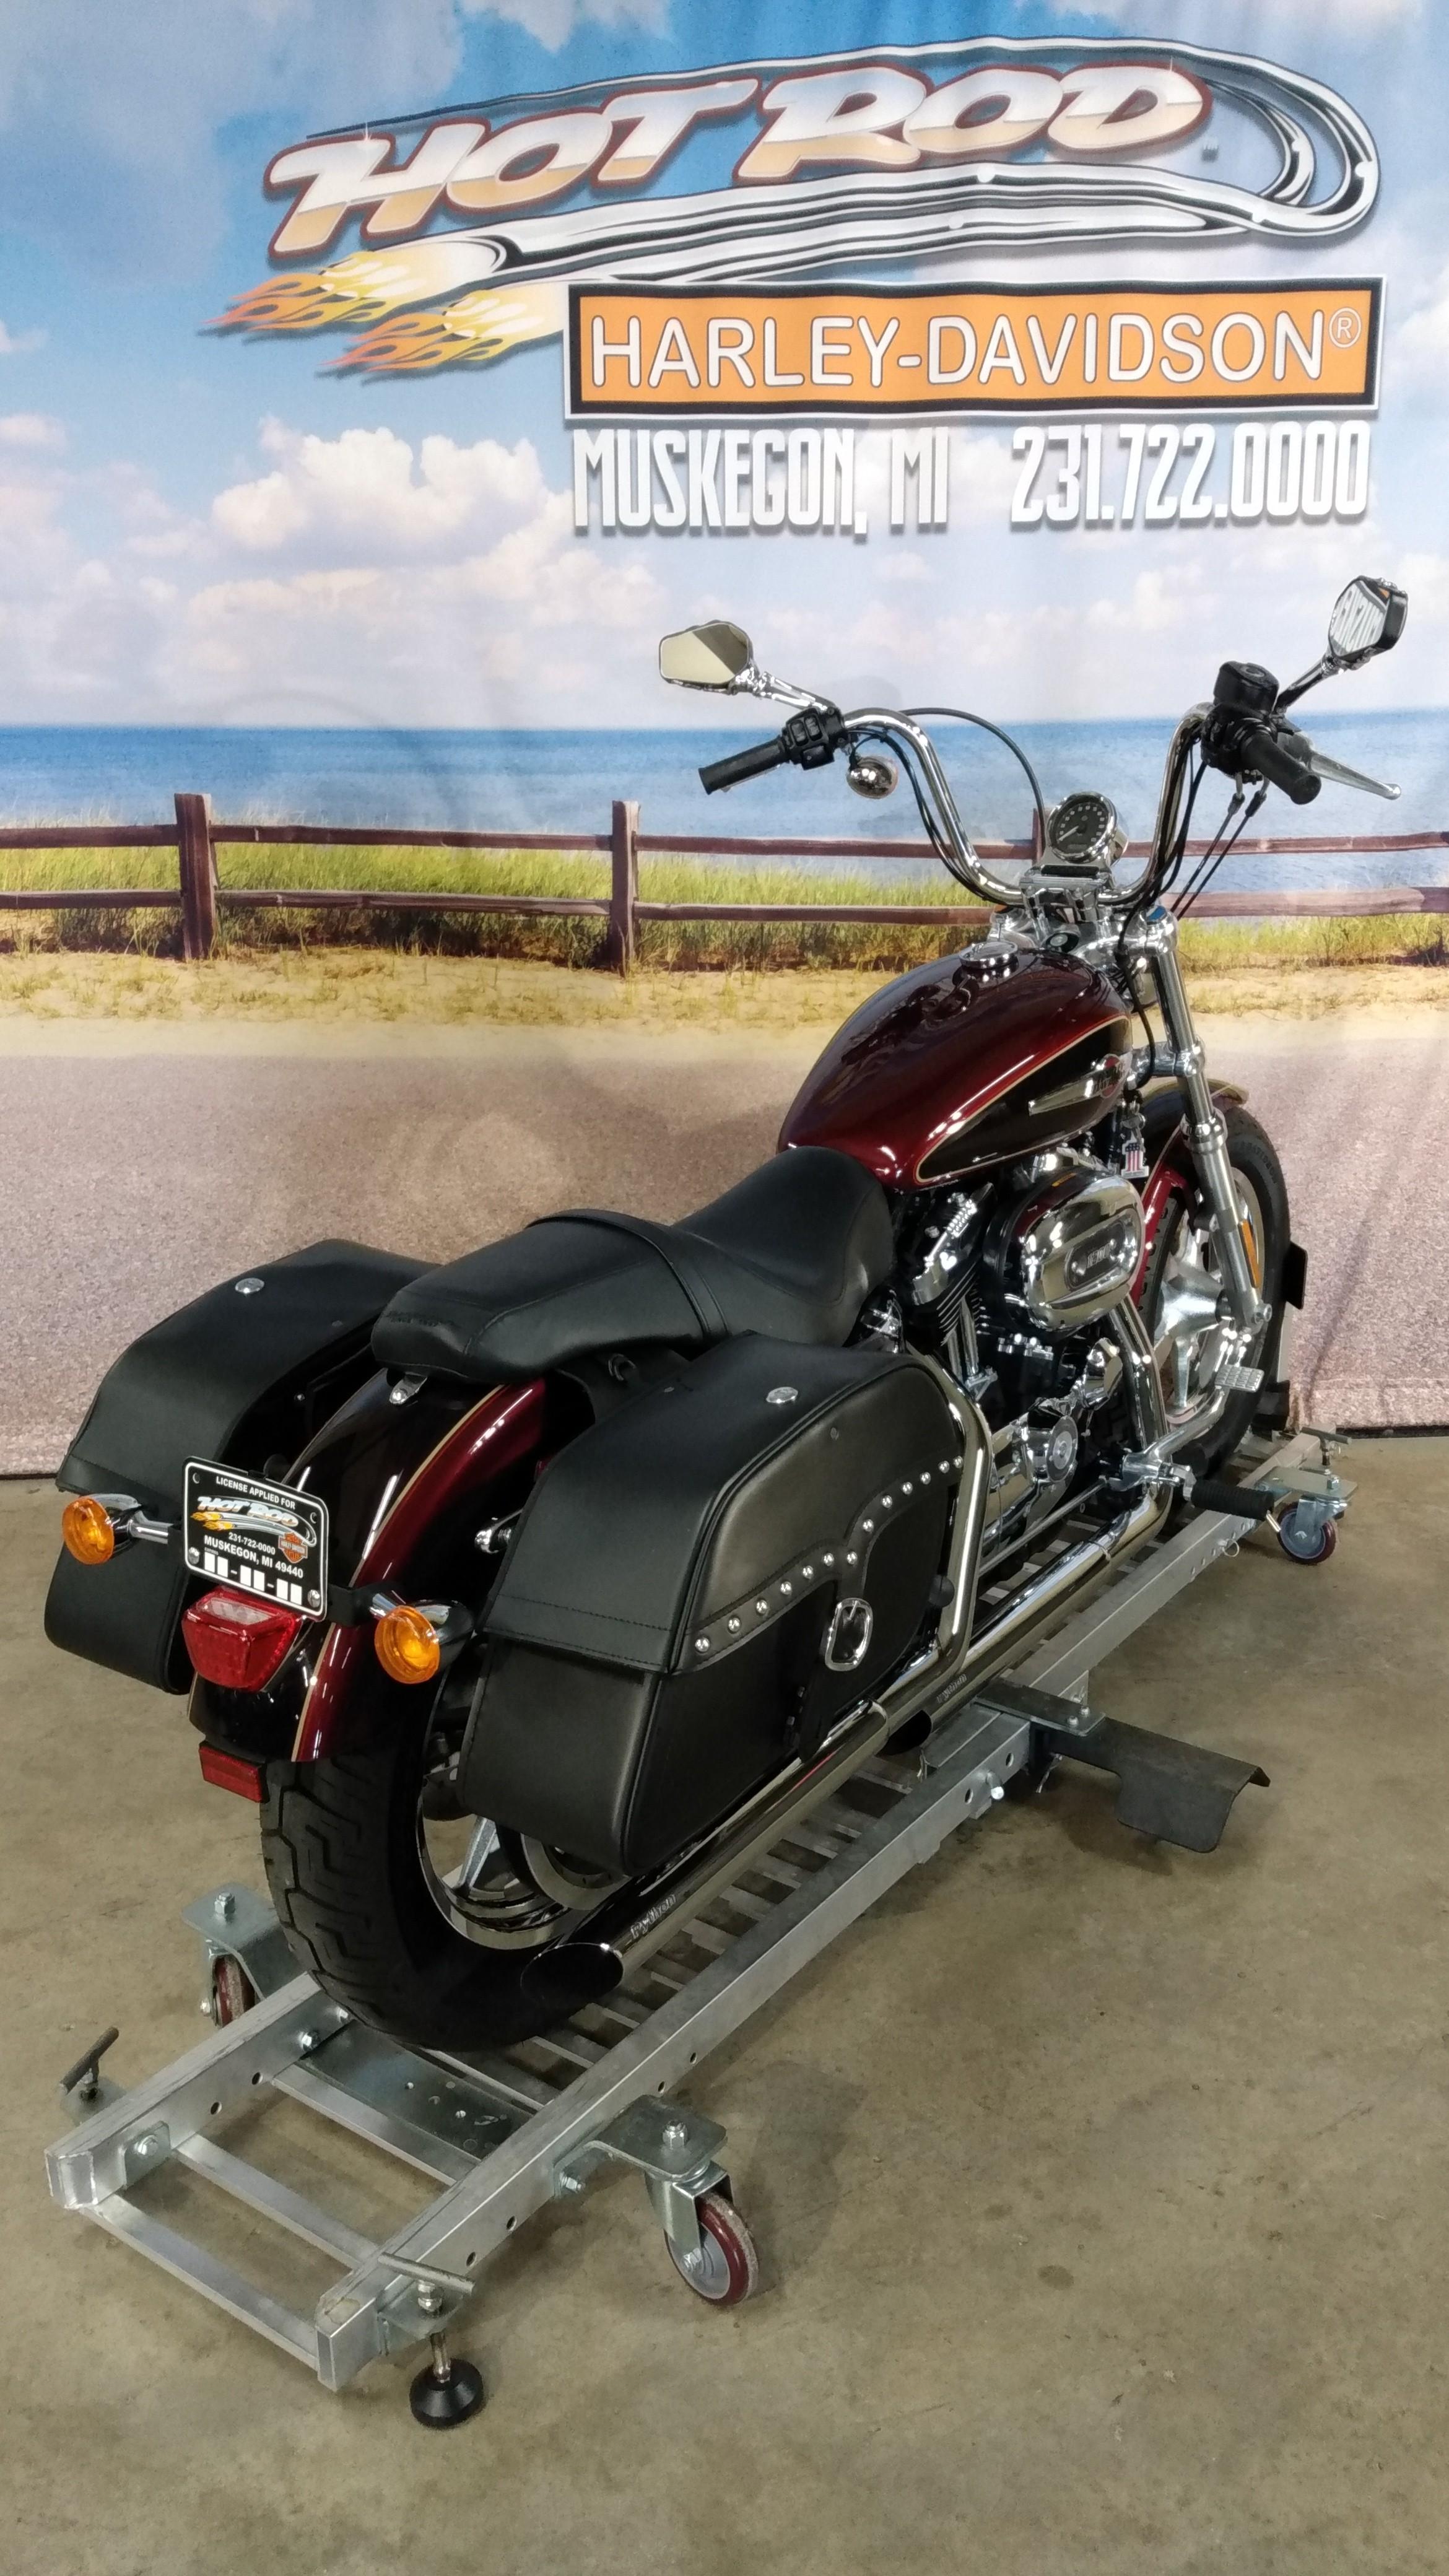 2014 Harley-Davidson Sportster 1200 Custom at Hot Rod Harley-Davidson